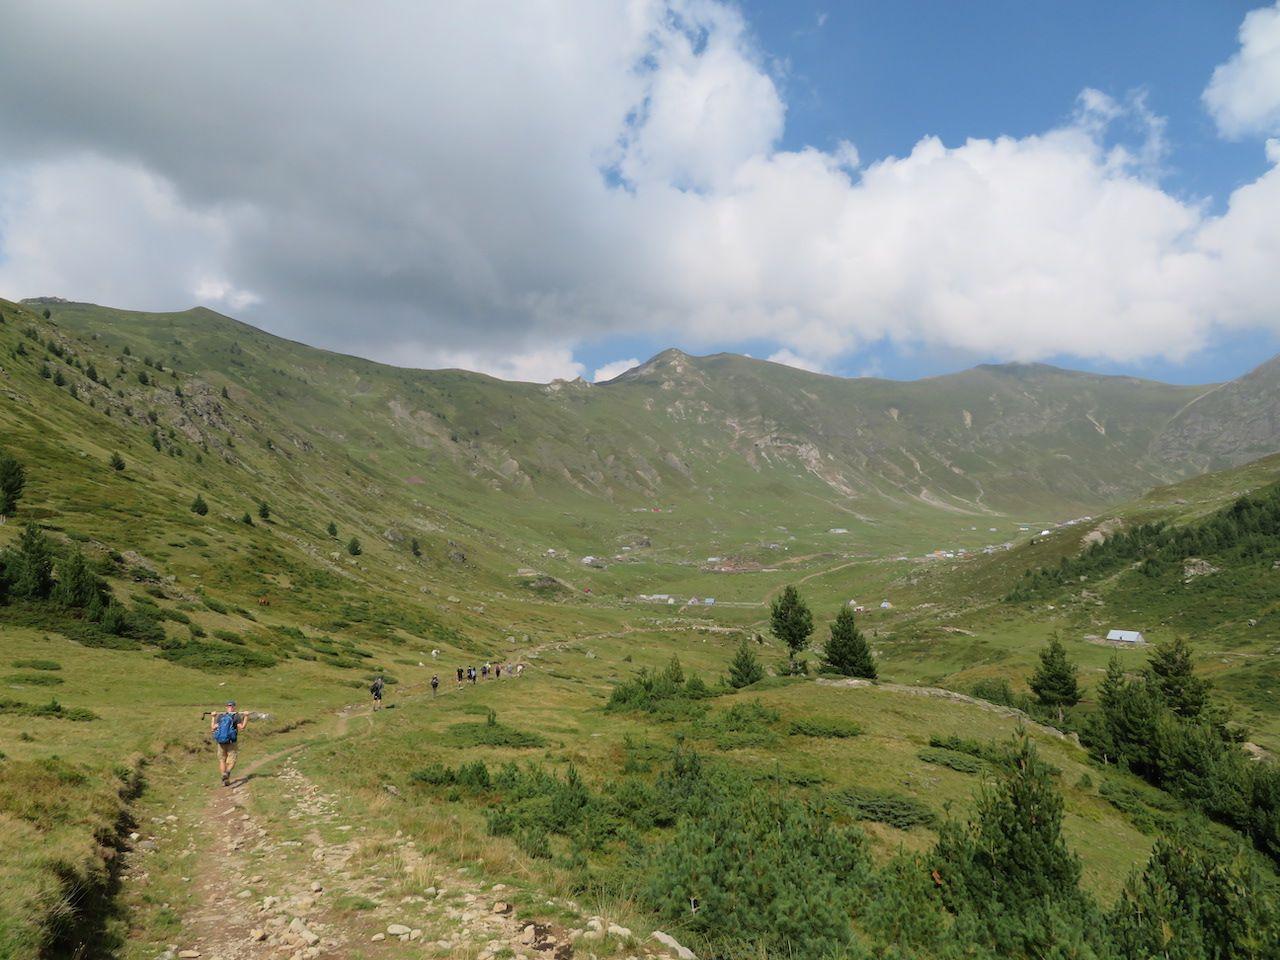 The village of Doberdol in the distance